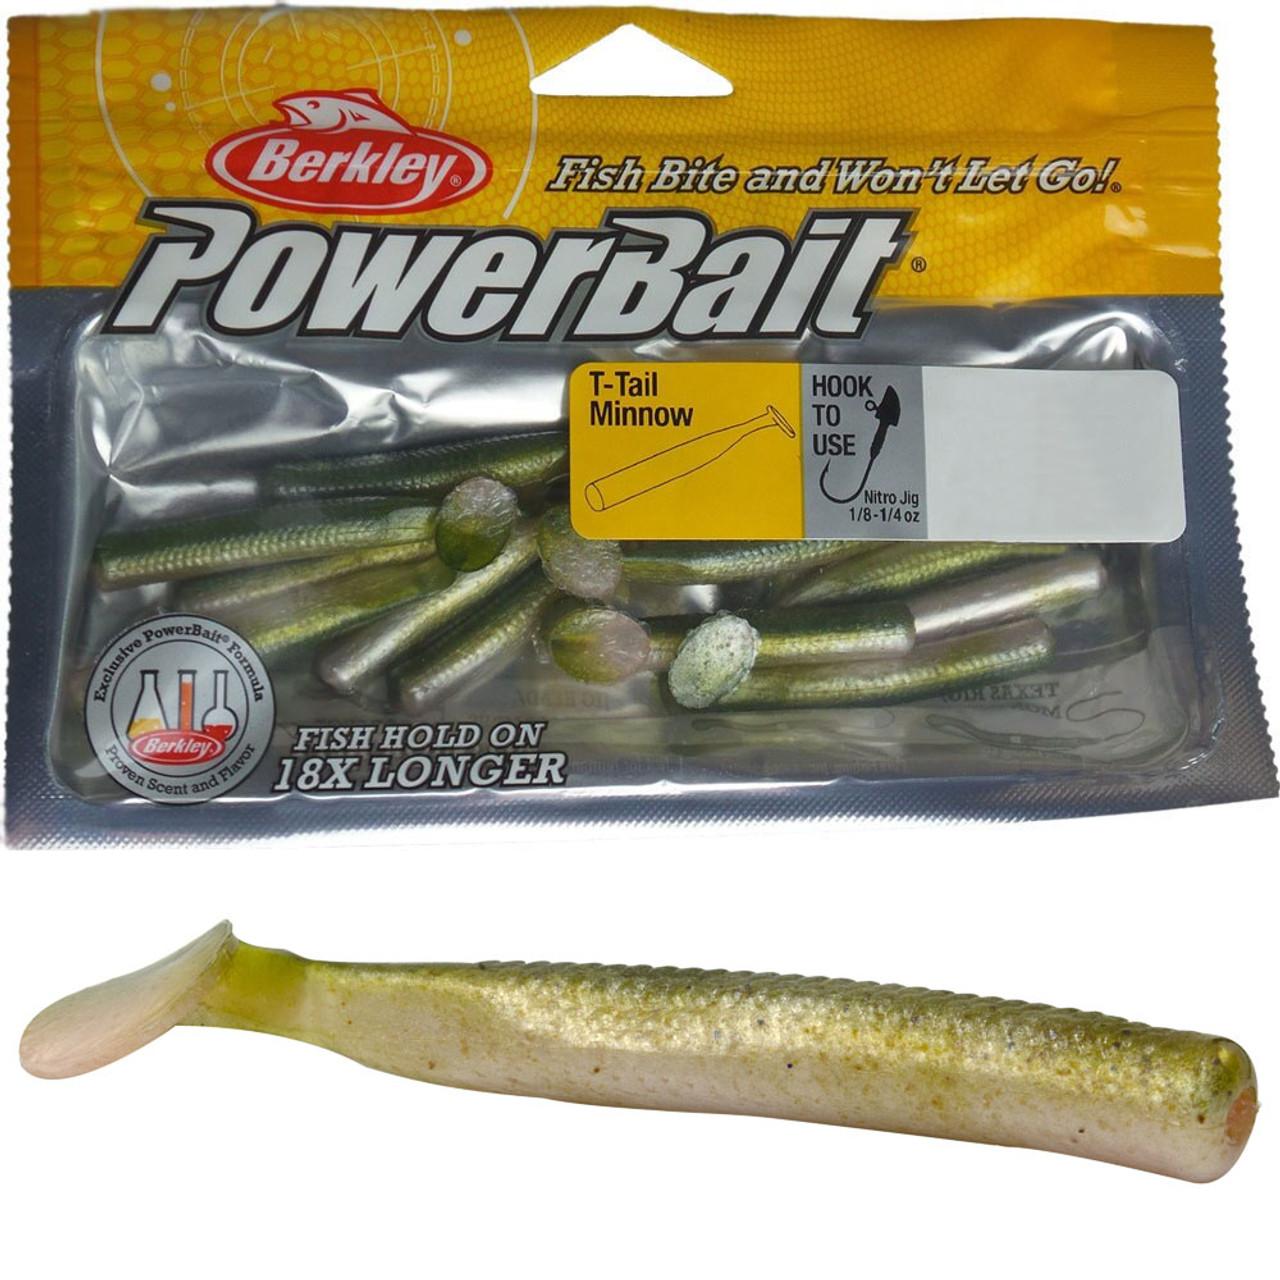 Berkley Powerbait T Tail Minnow Fishing Lures